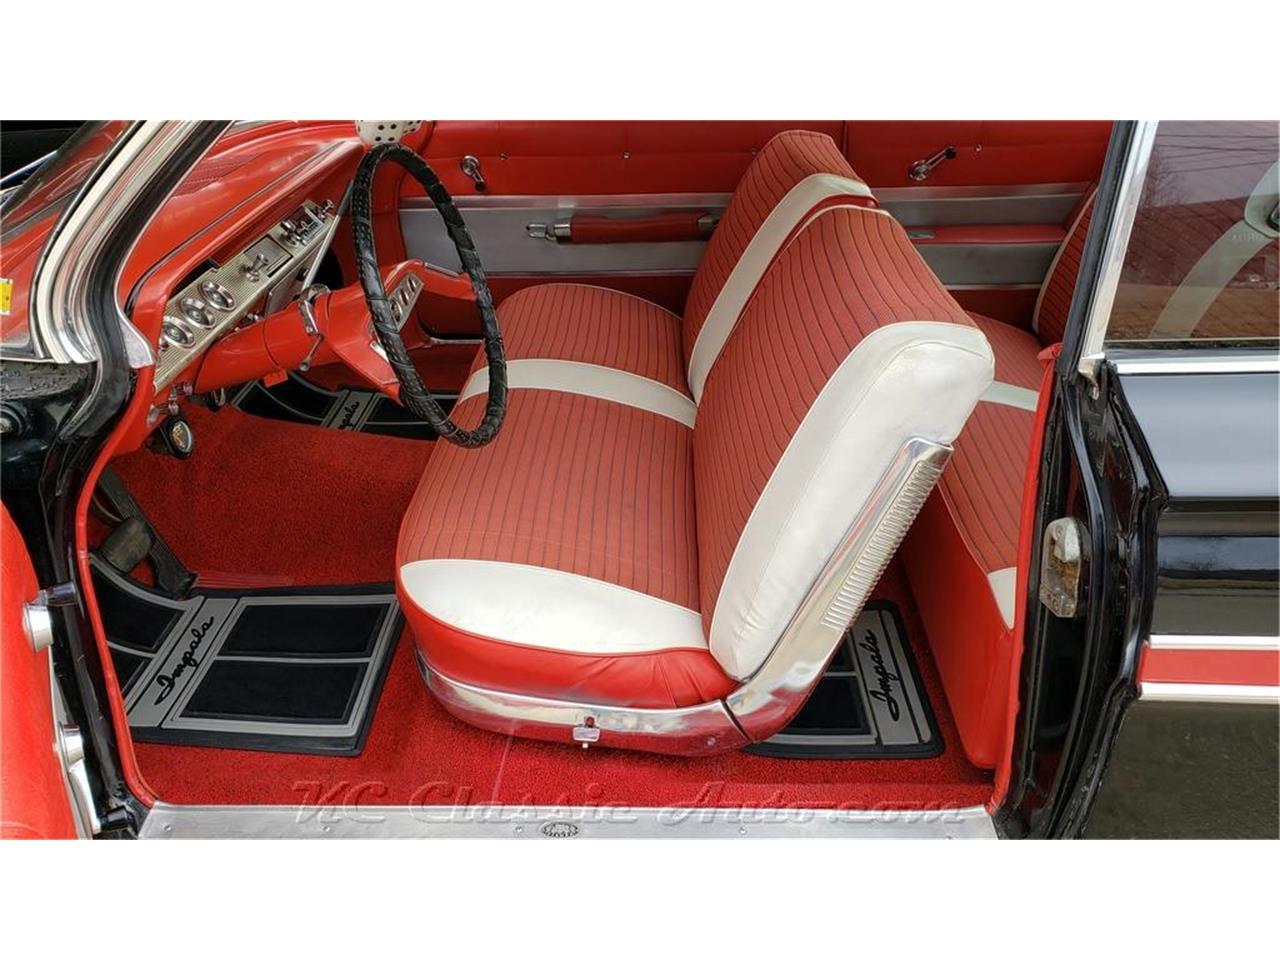 Large Picture of Classic 1961 Chevrolet Impala located in Lenexa Kansas - $44,900.00 - PUAS